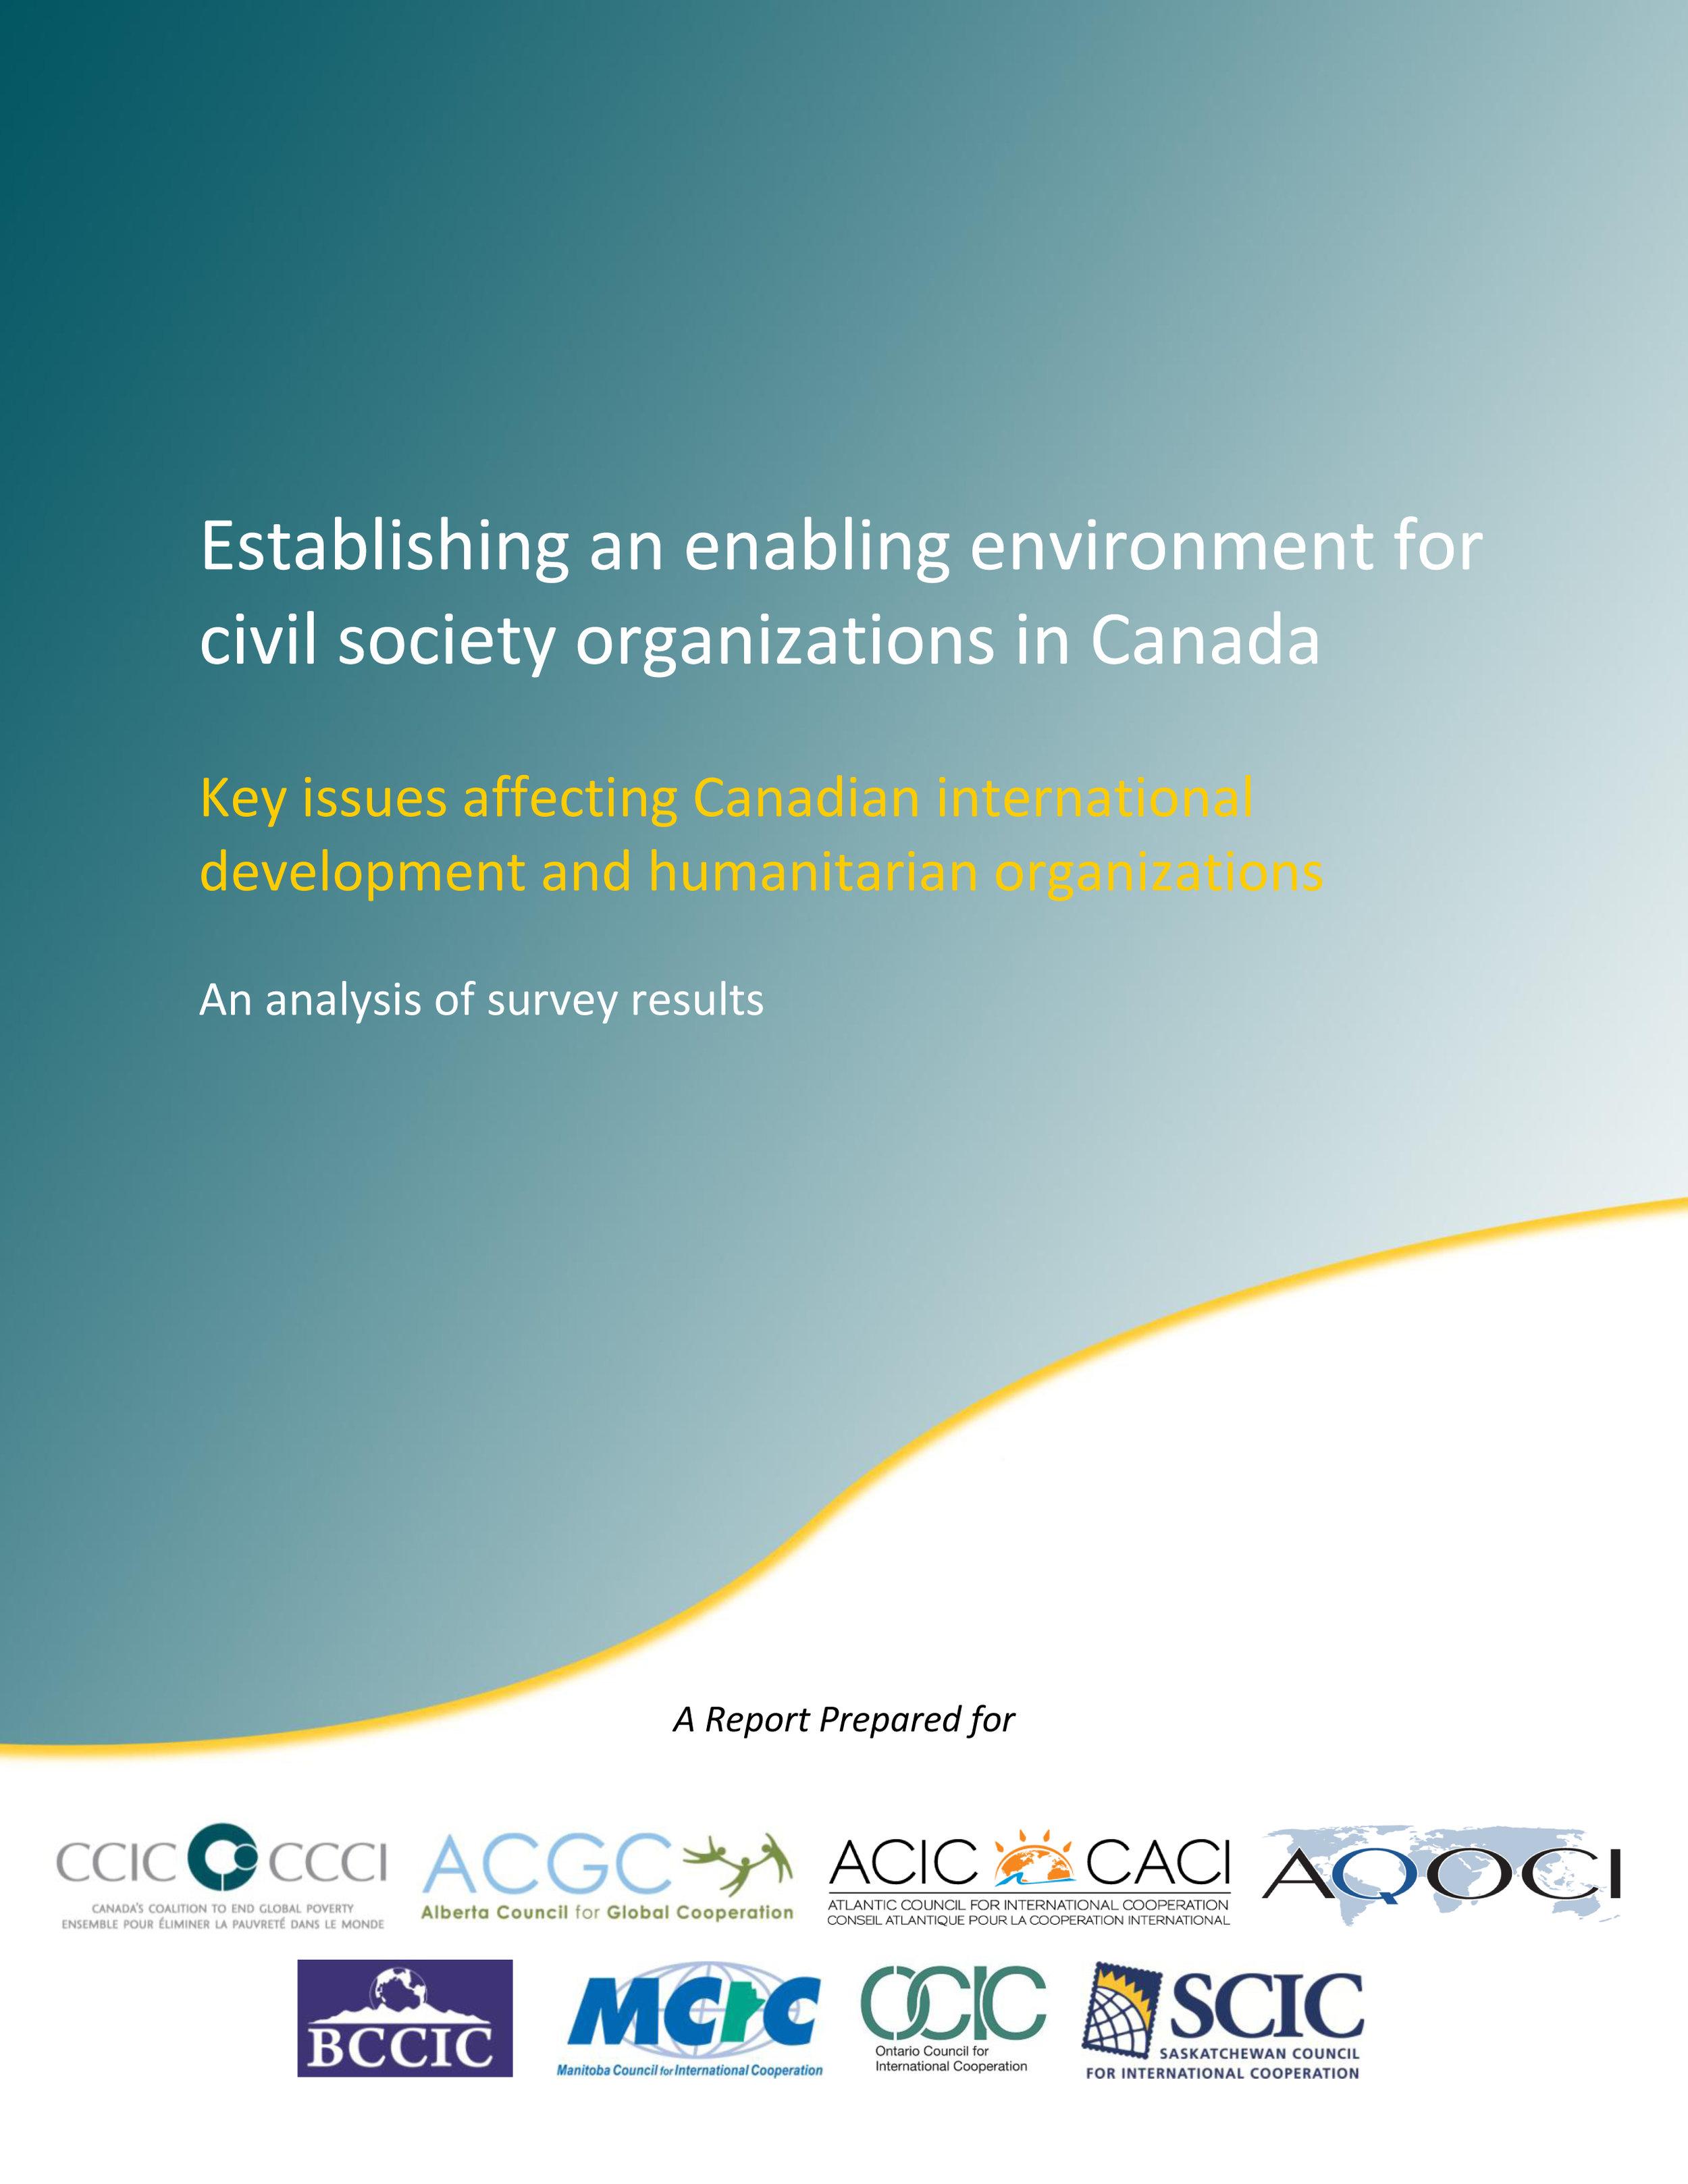 Establishing an enabling environment for civil society organizations in Canada